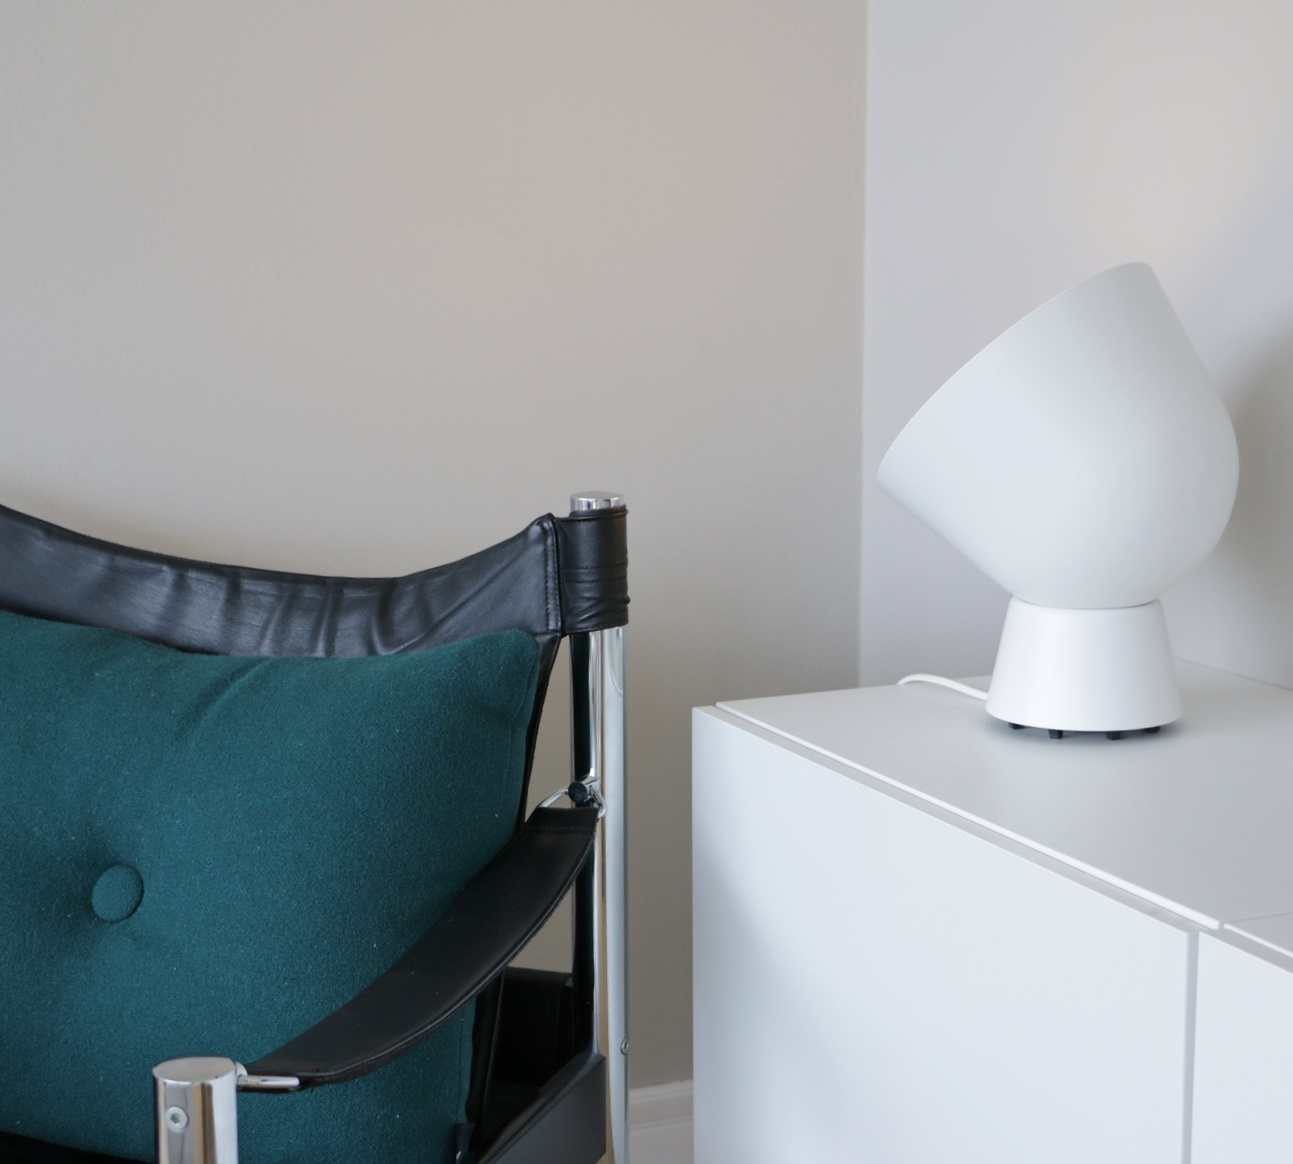 ikea ps spind inspiration design raum und. Black Bedroom Furniture Sets. Home Design Ideas